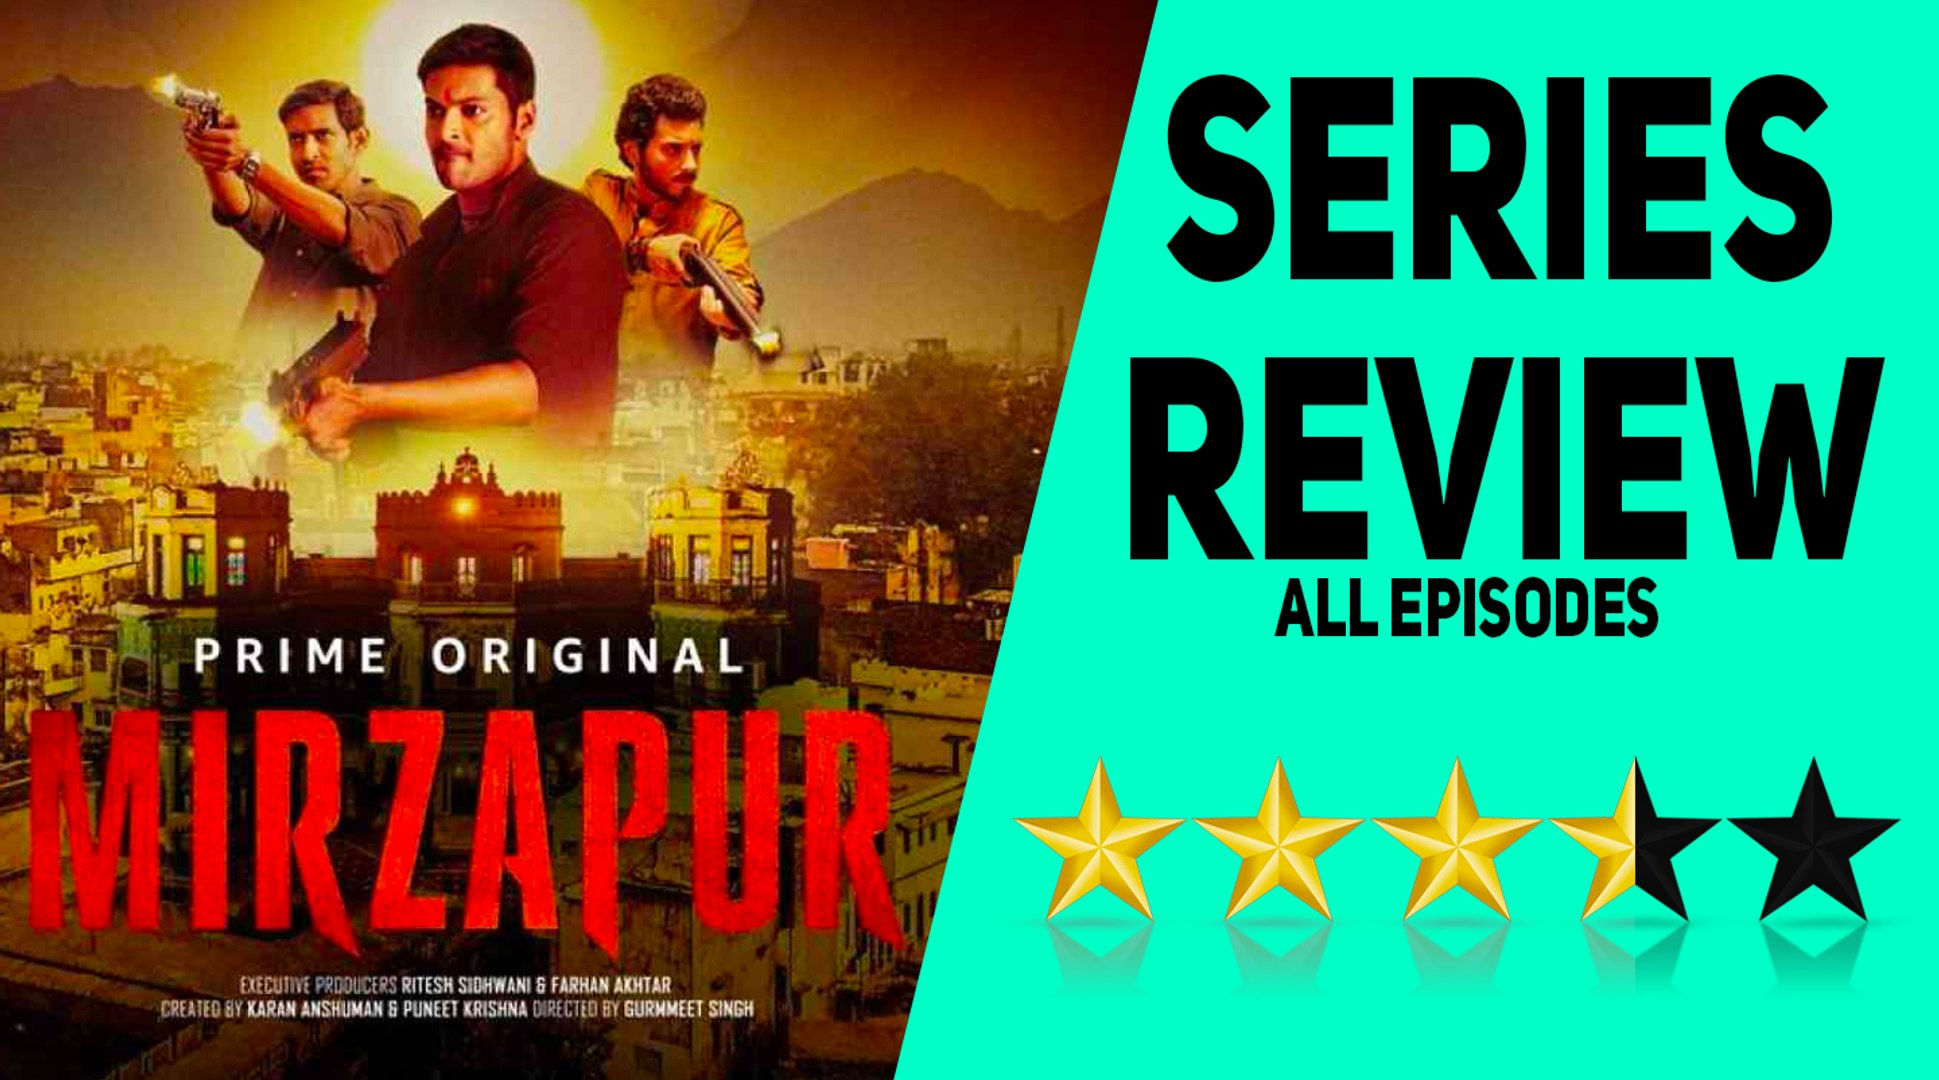 Mirzapur Series Review | Pankaj Tripathi, Ali Fazal, Vikrant Massey |  Amazon Prime Video